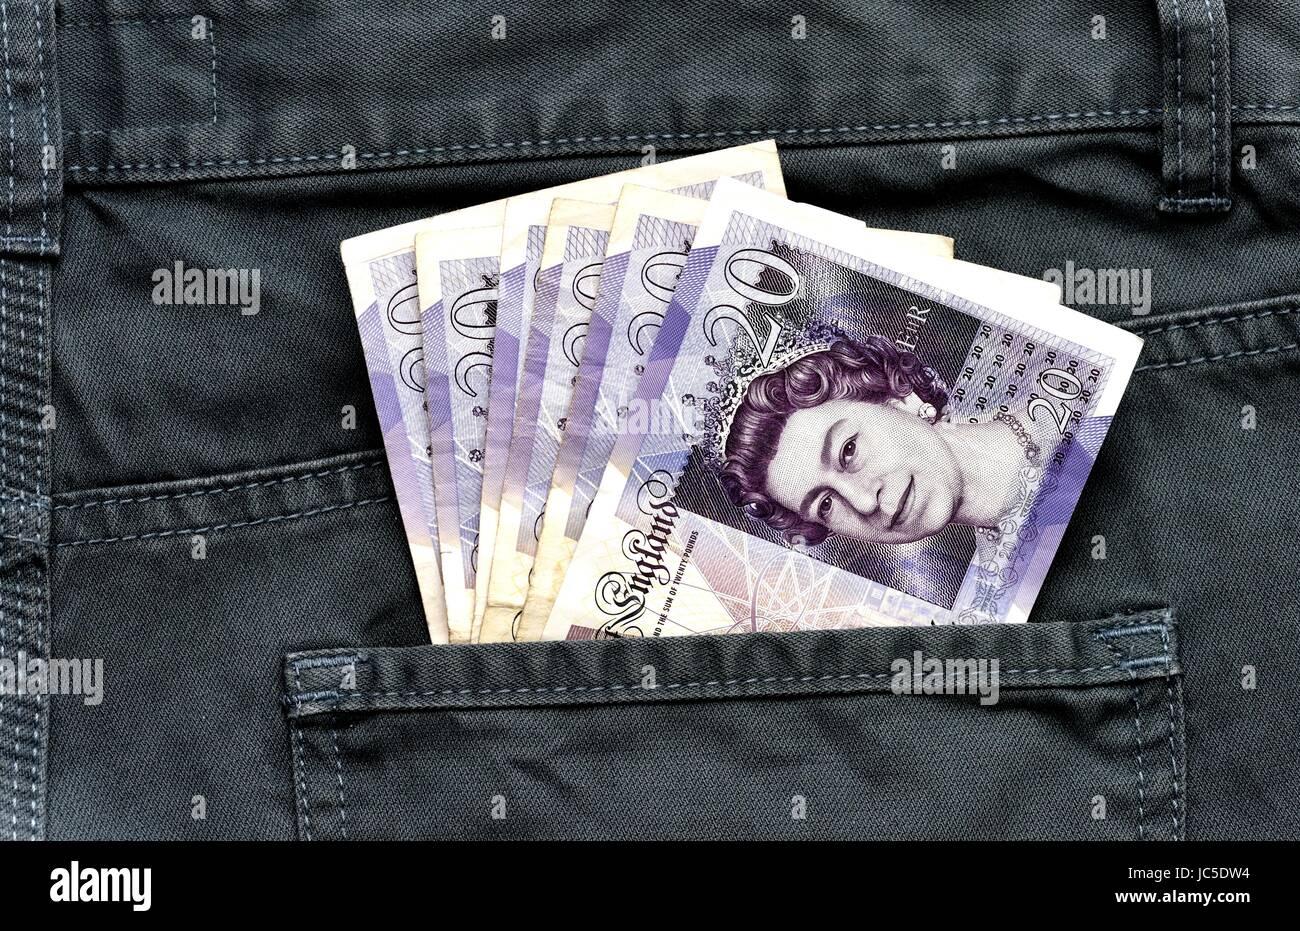 20 pound notes - Stock Image